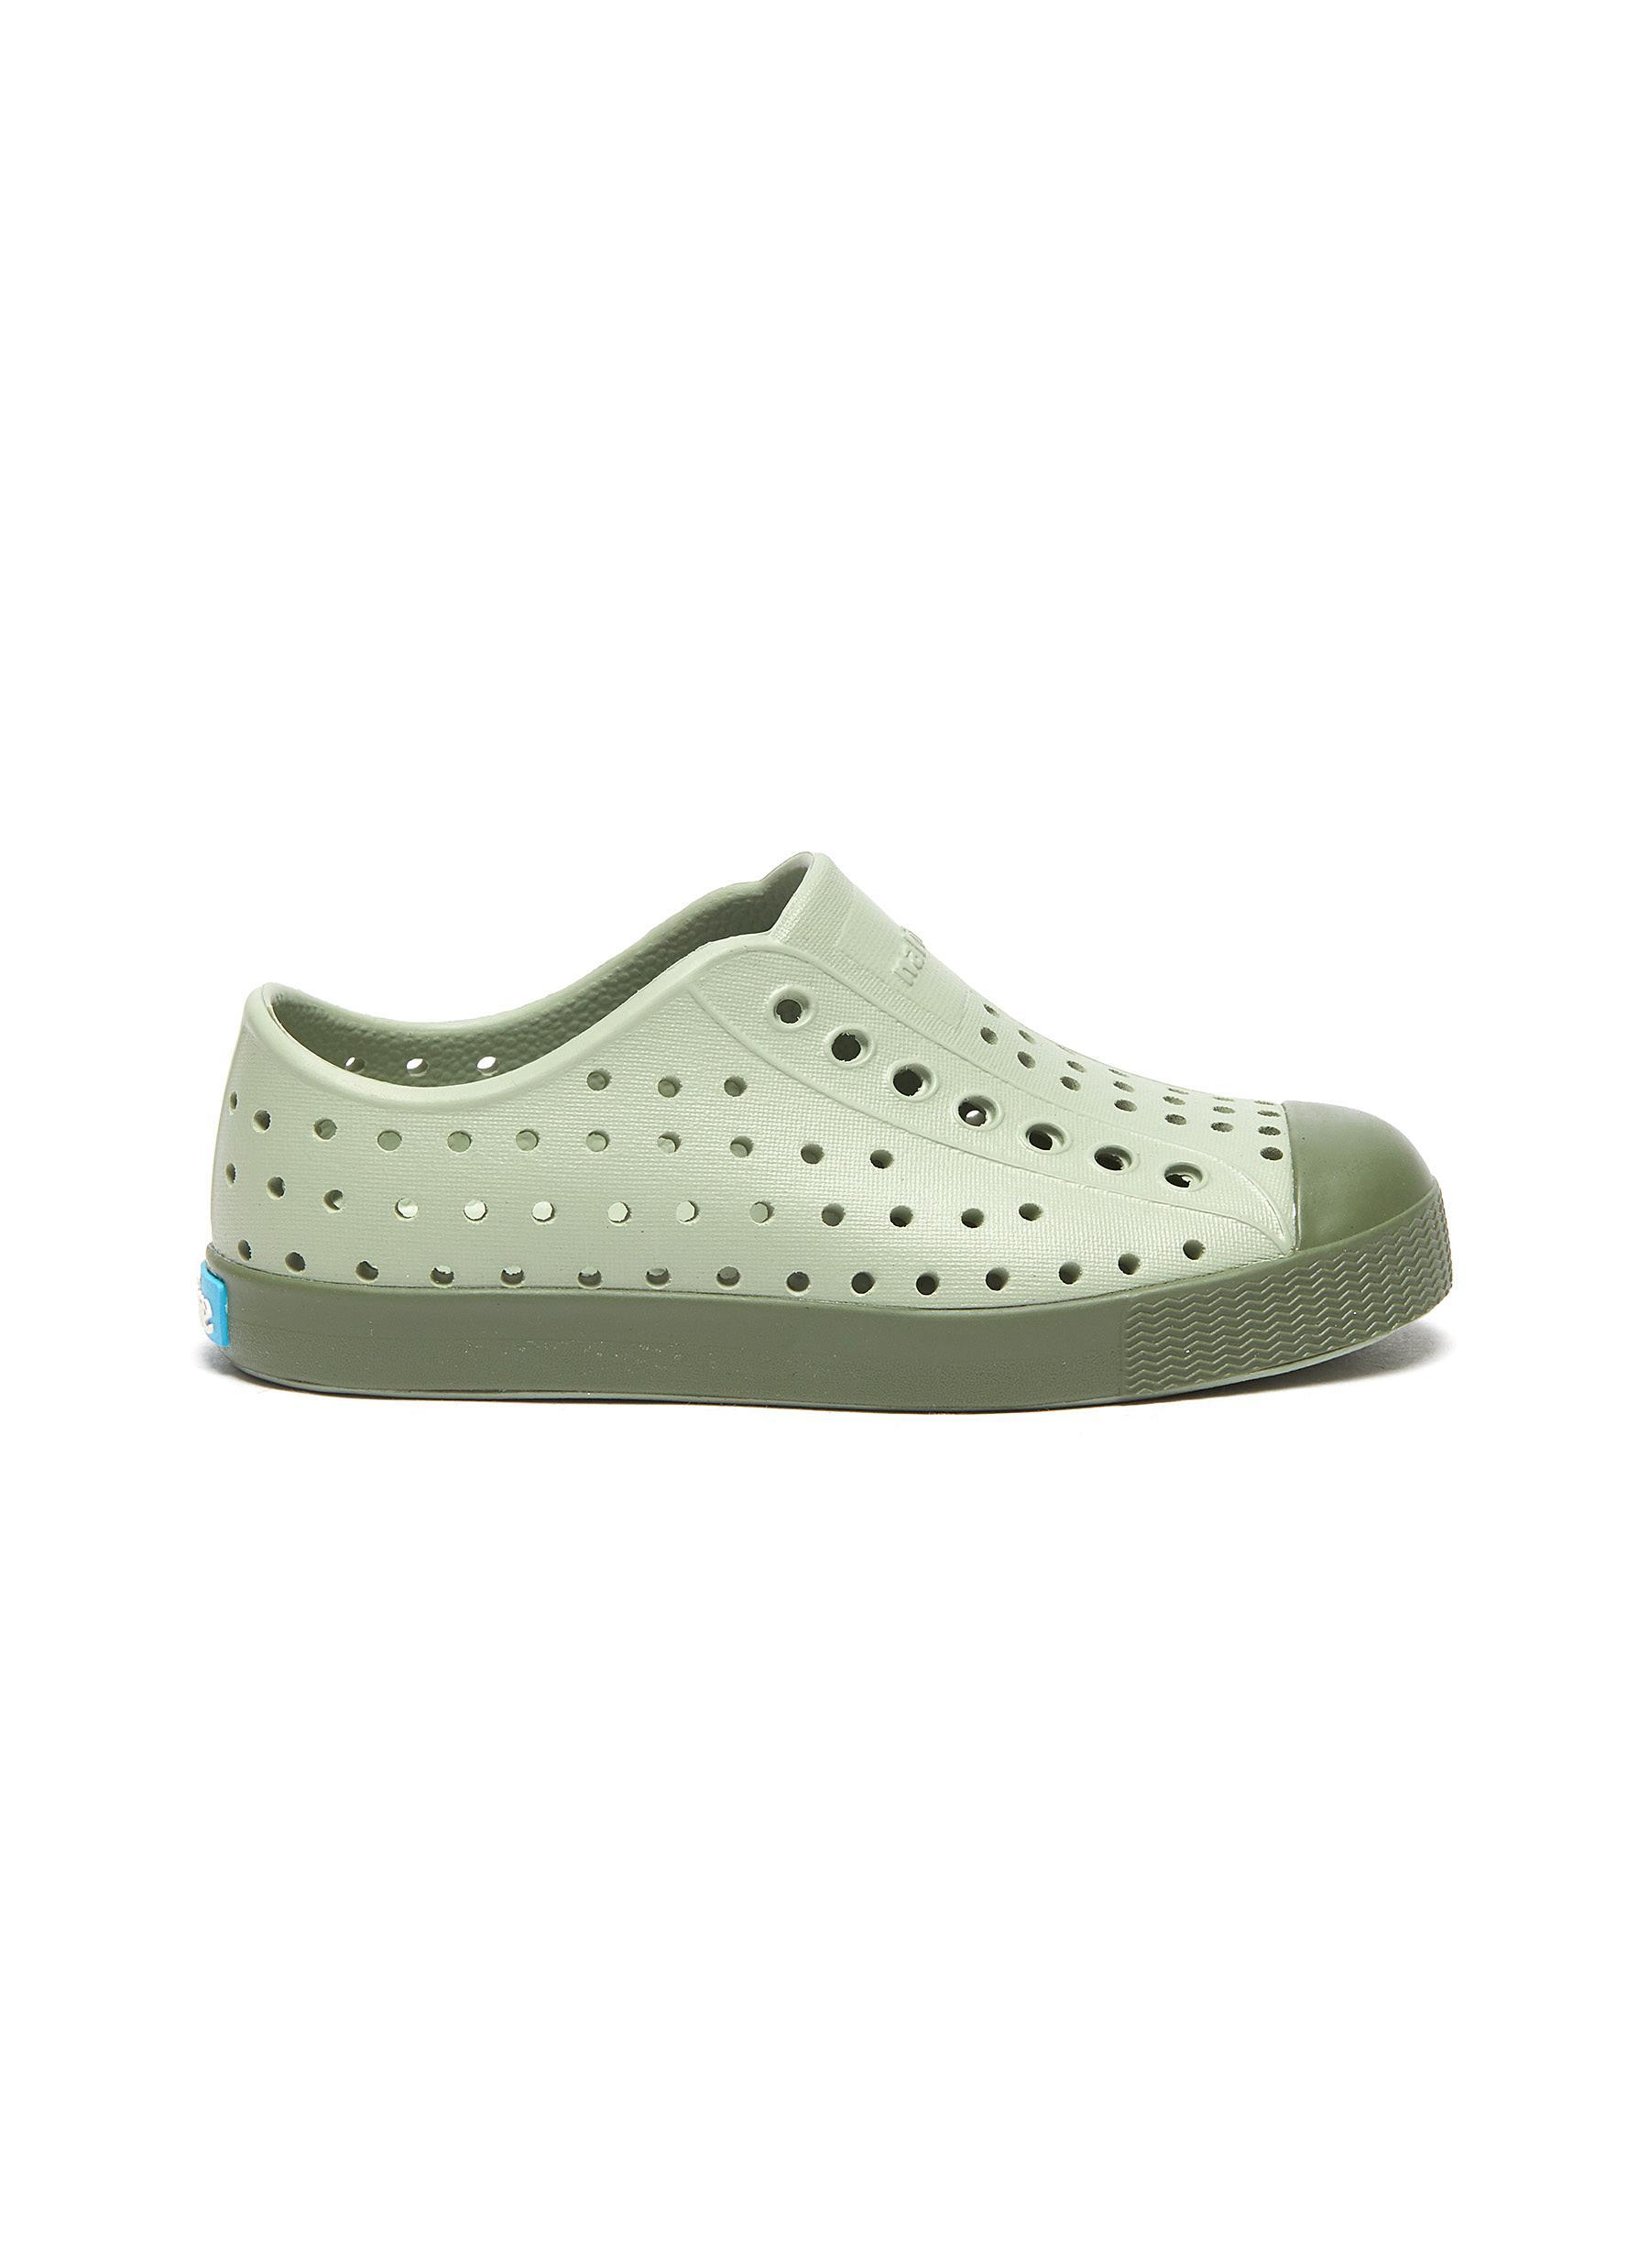 Jefferson' perforated toddler slip-on sneakers - NATIVE - Modalova